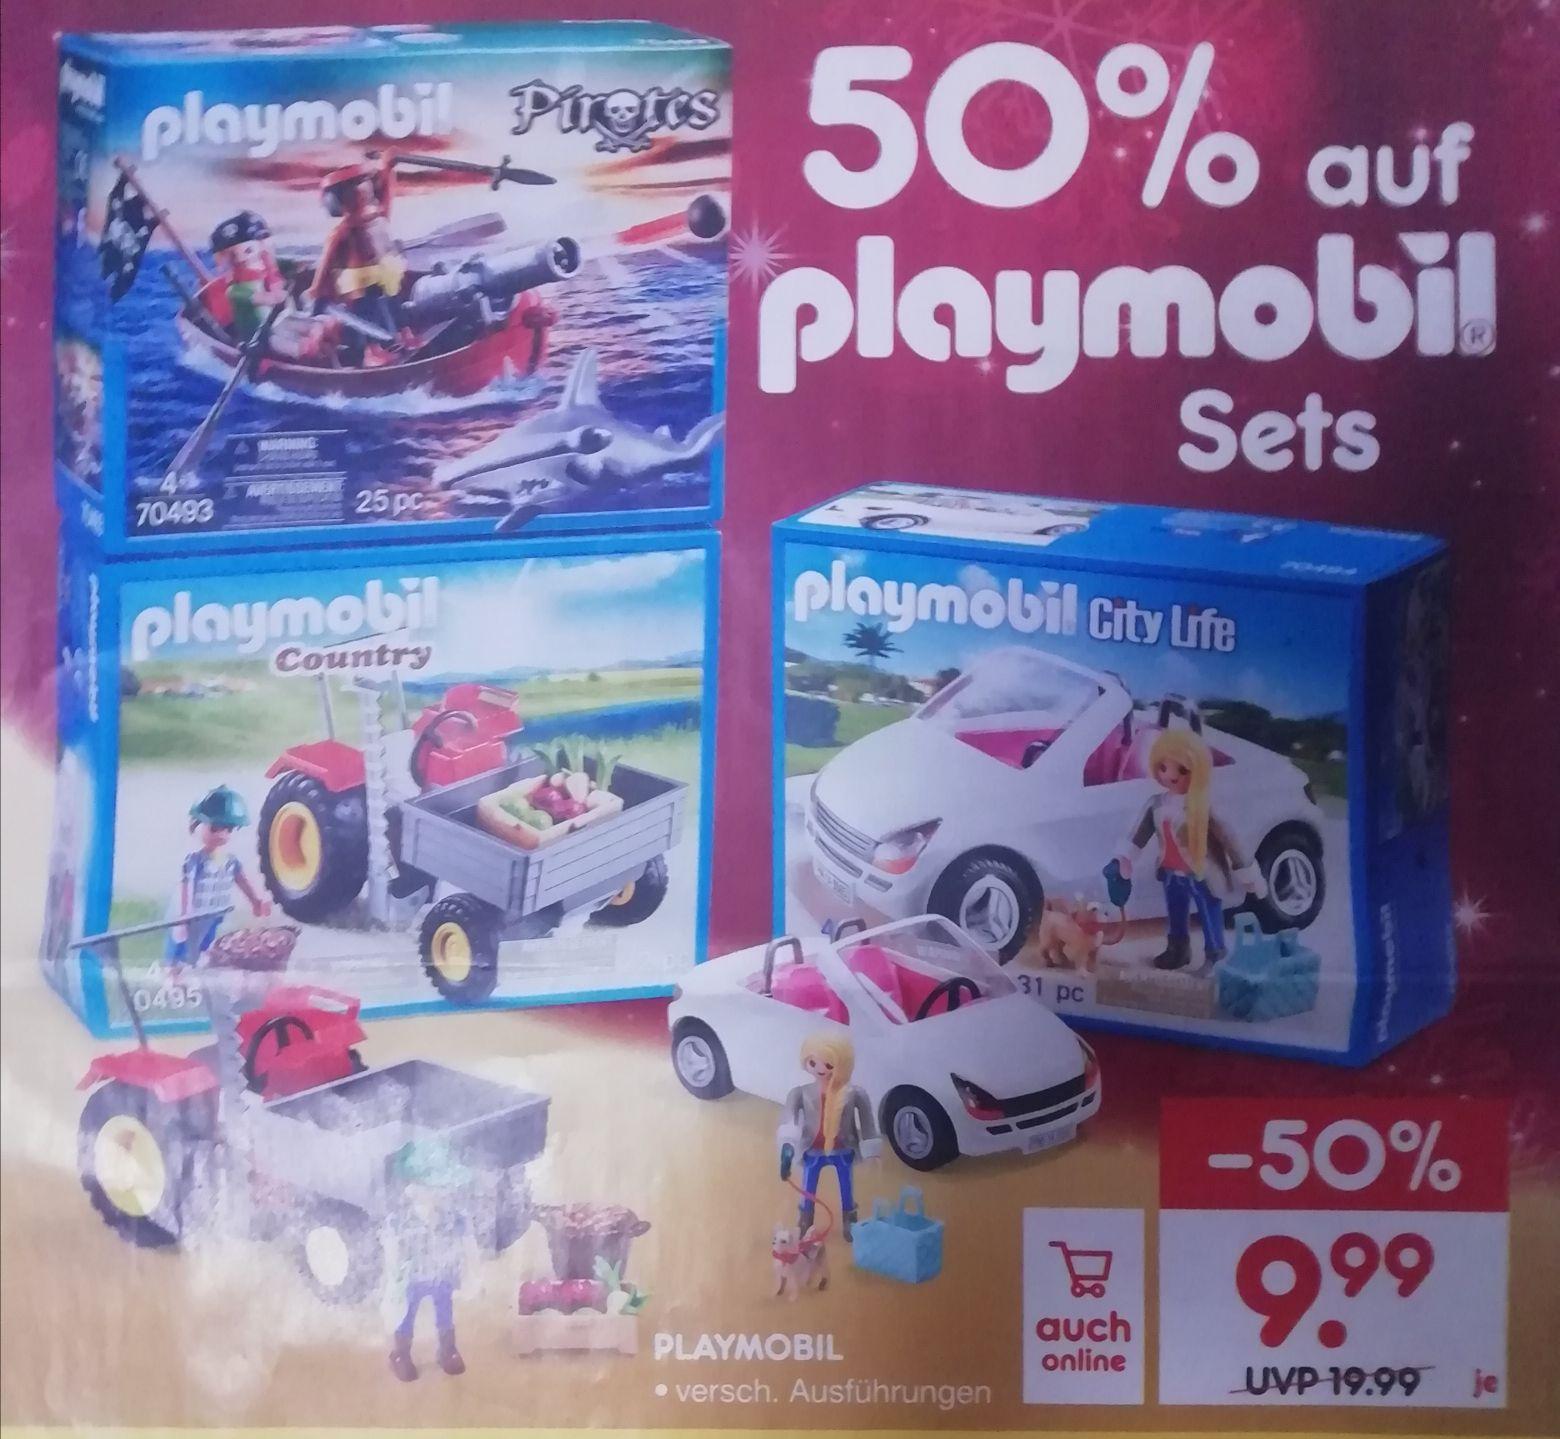 [Netto ab 18.11 on/offline] Alle Playmobil Sets 50% günstiger